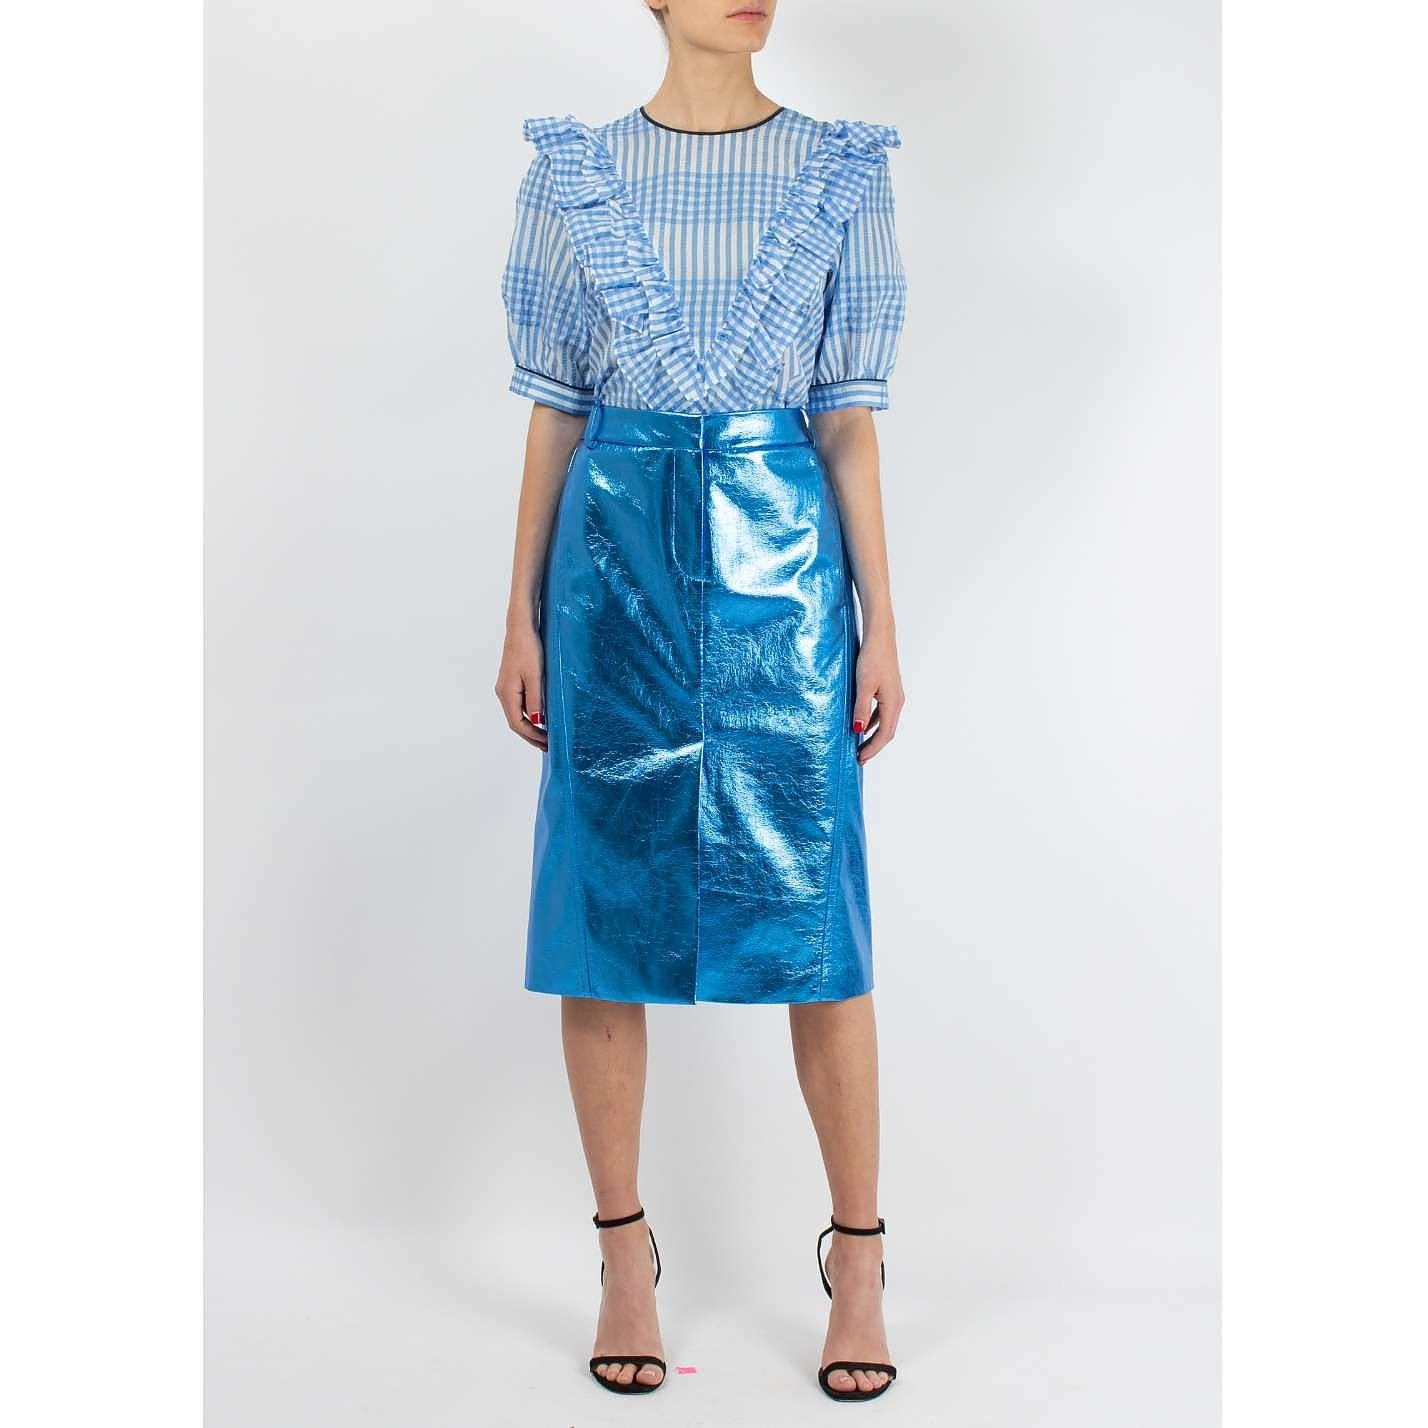 Tibi High Waist Metallic Skirt